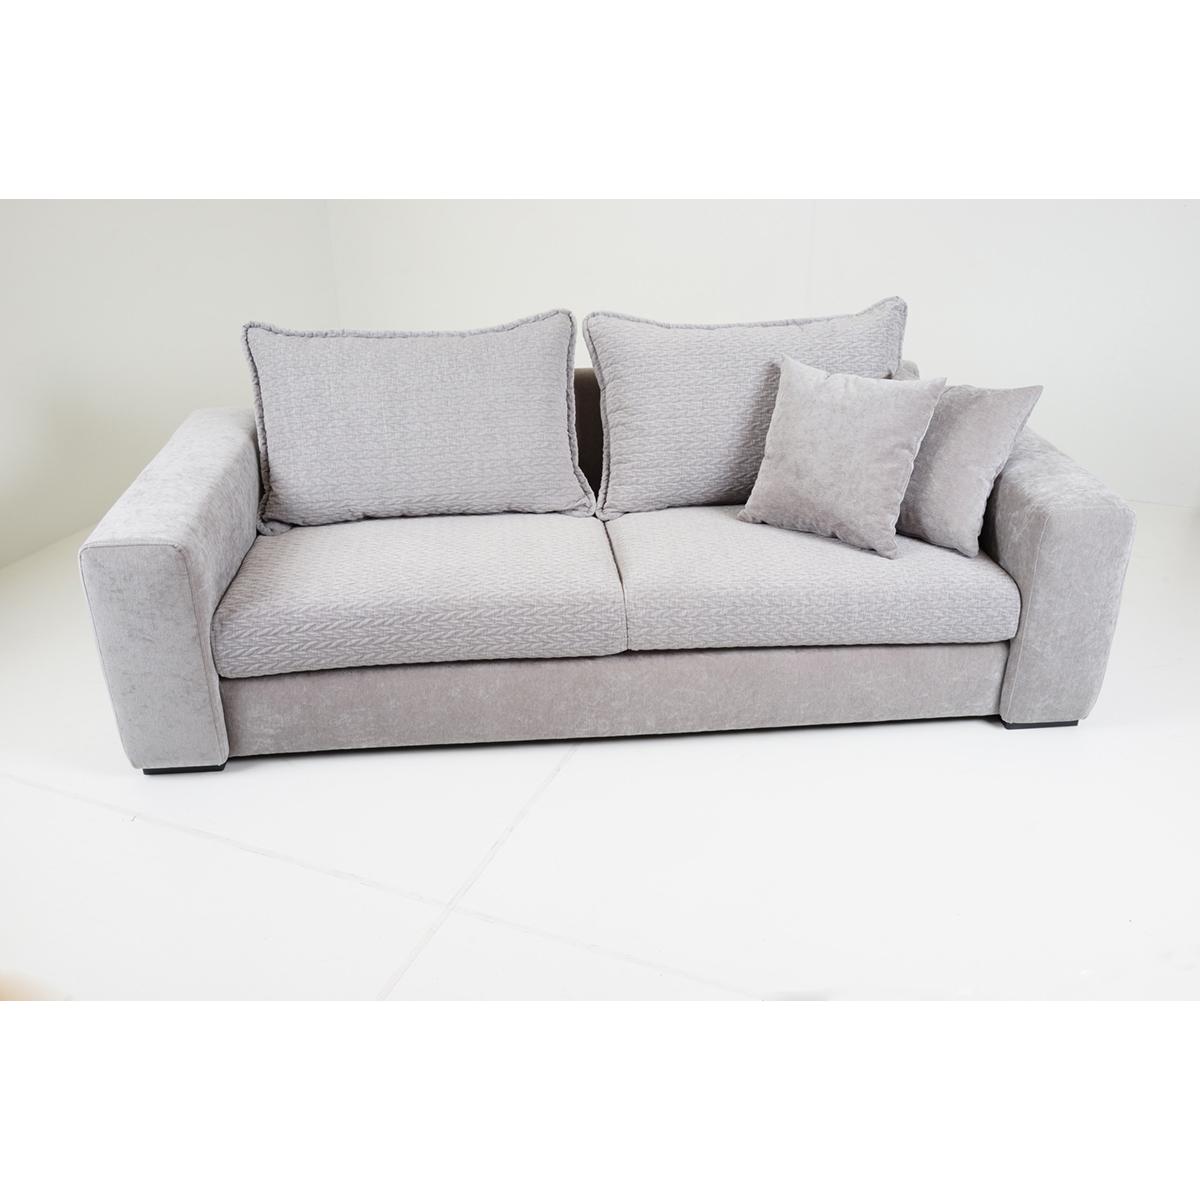 sofa venezia das designersofa mit stil nur bei moebel trend 24 online kaufen moebel trend 24. Black Bedroom Furniture Sets. Home Design Ideas